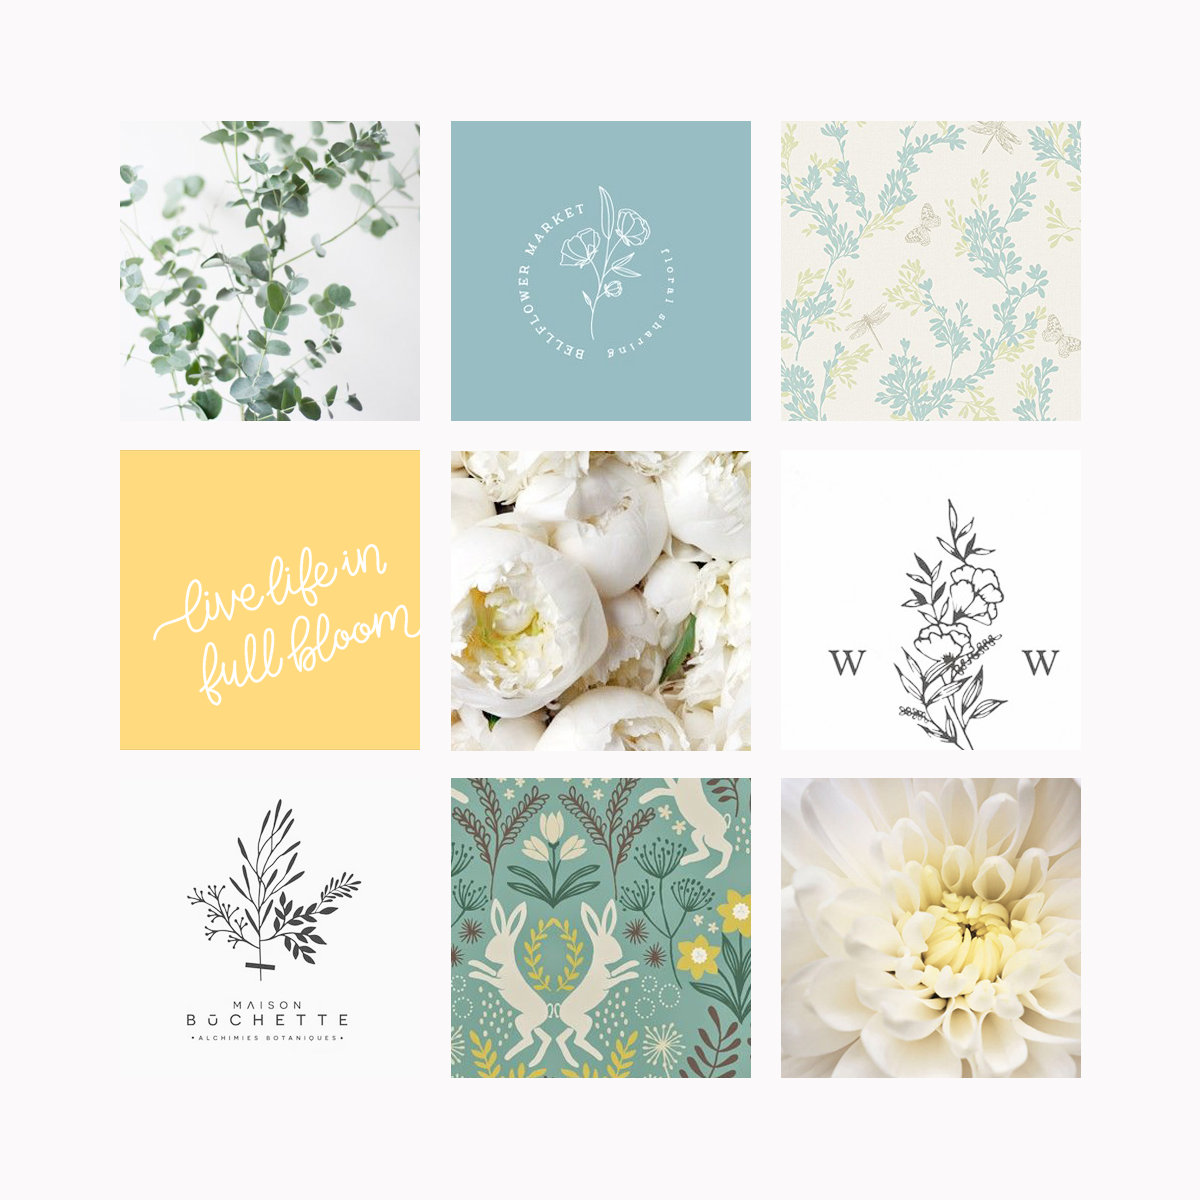 Ivory Bell Floral Logo & Branding Mood board Bea & Bloom Creative Design Studio